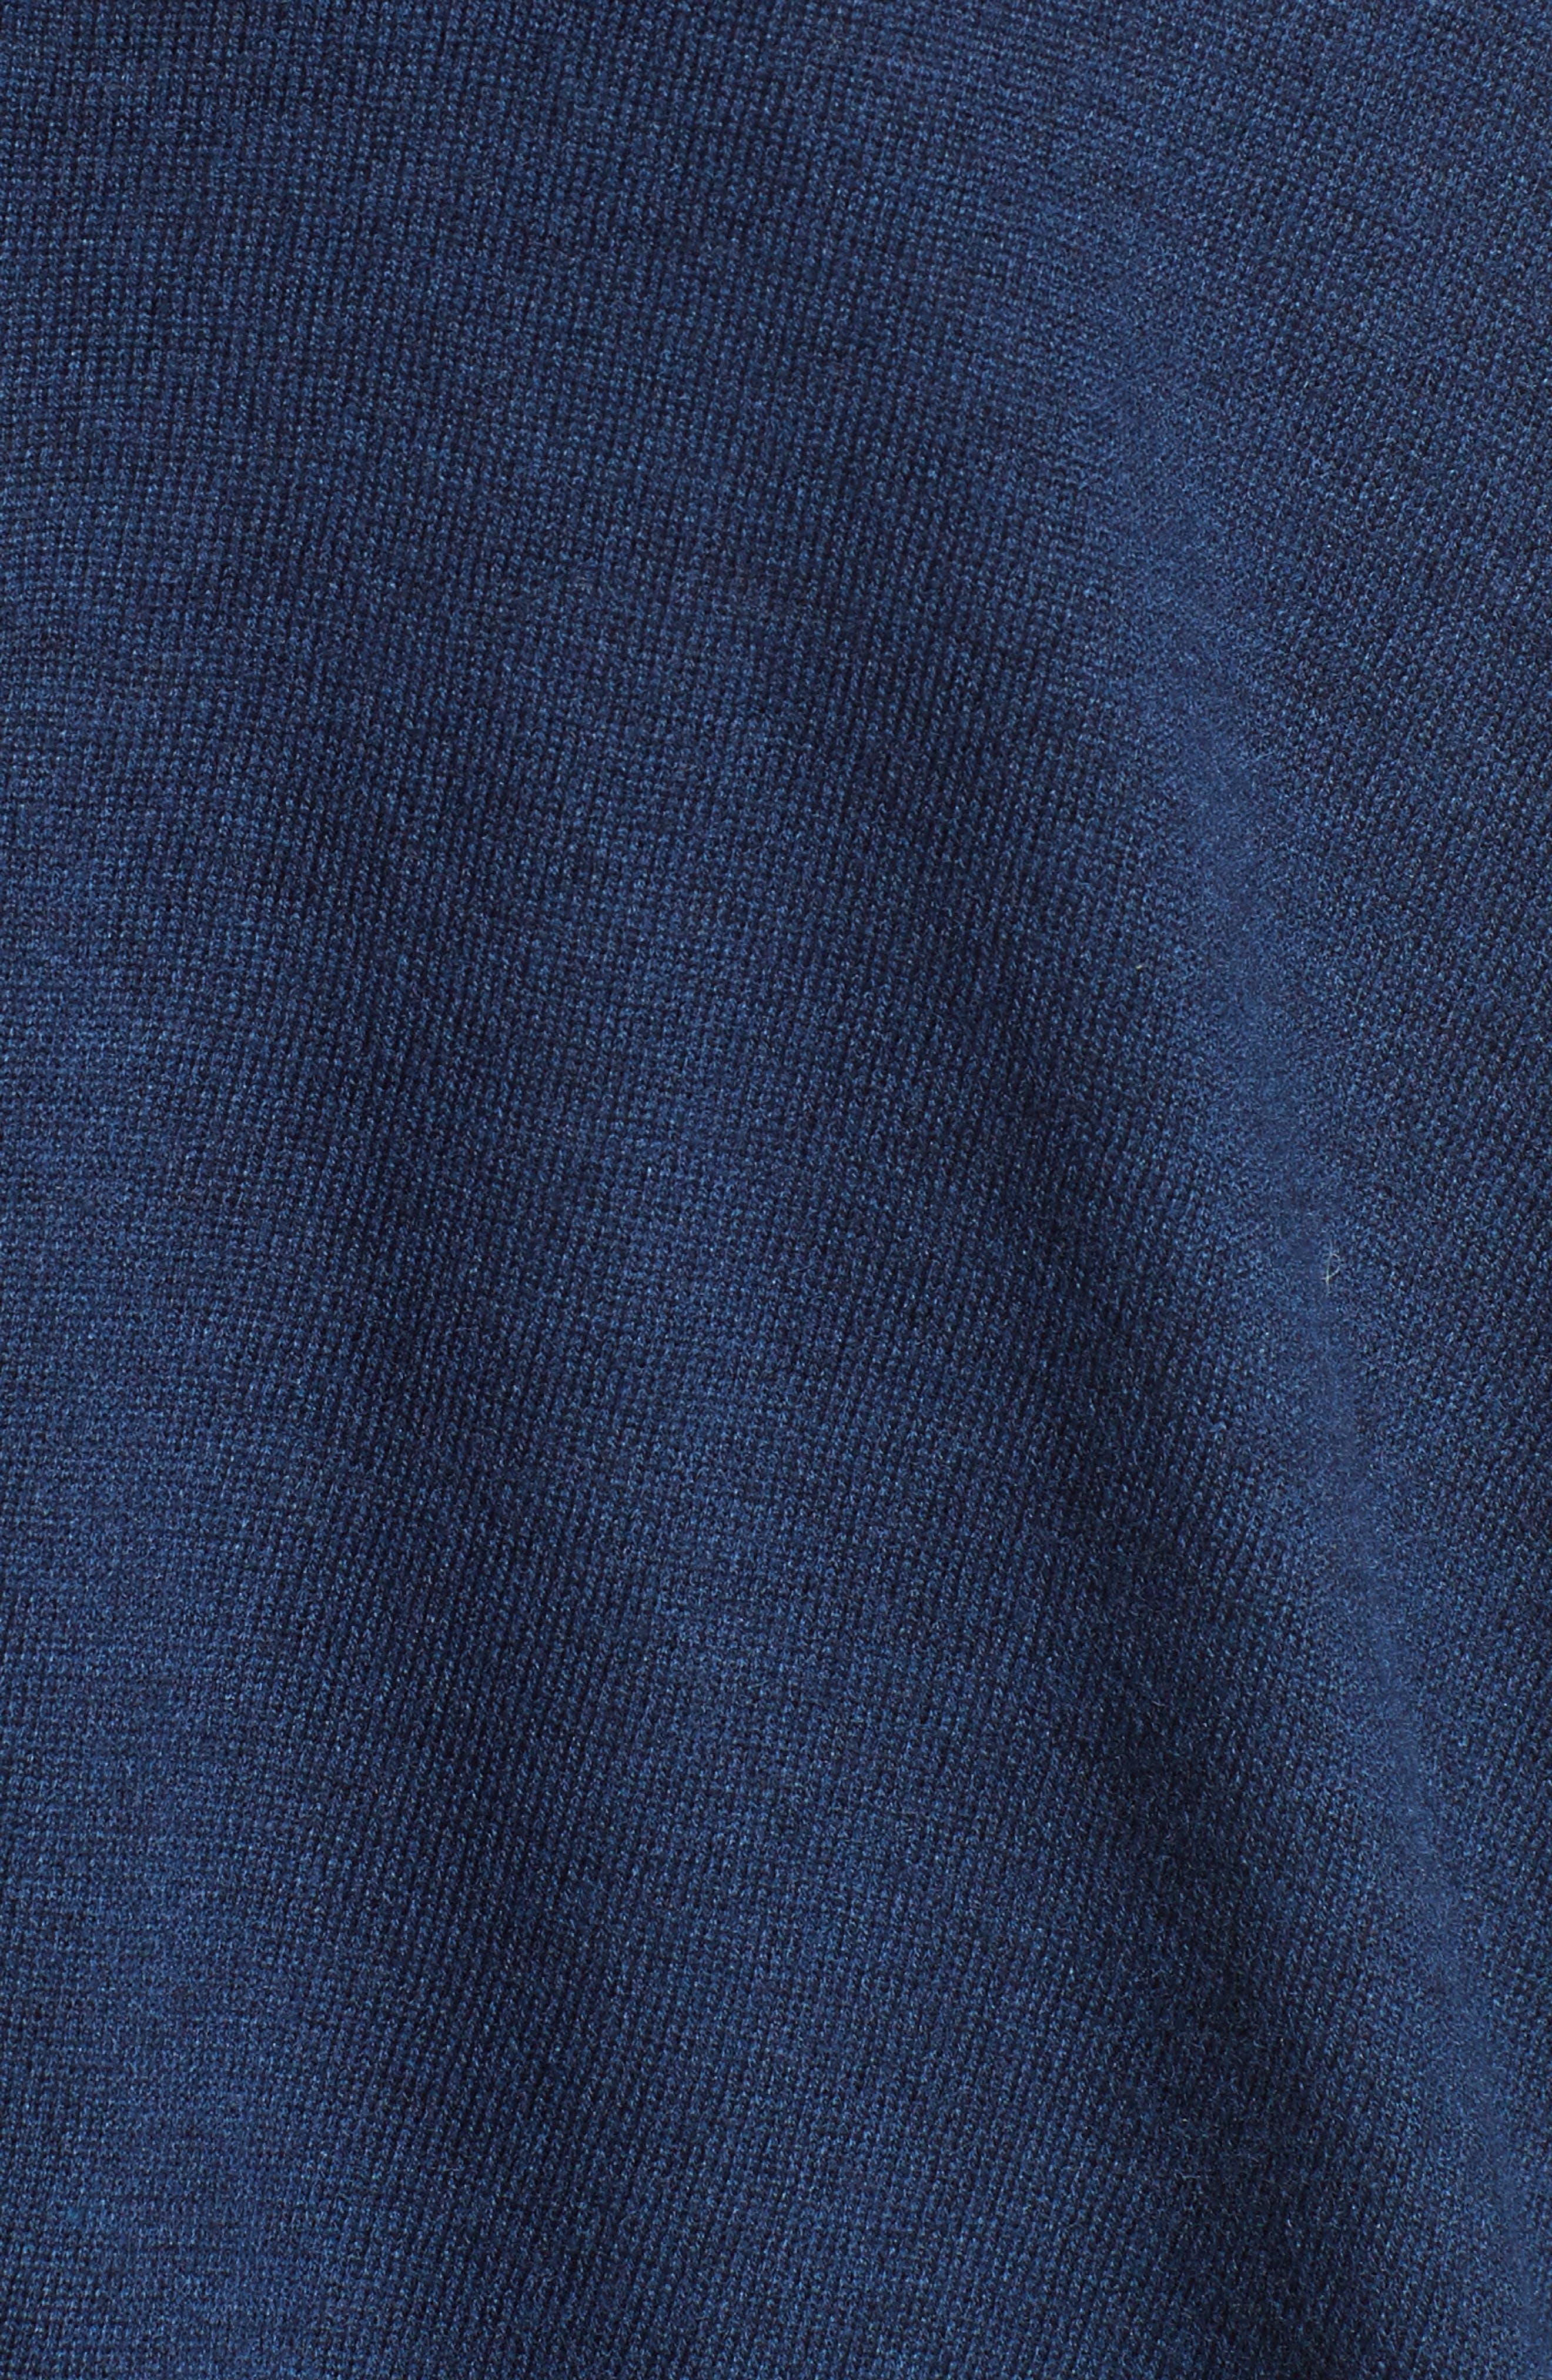 Marlis Knit Cardigan,                             Alternate thumbnail 15, color,